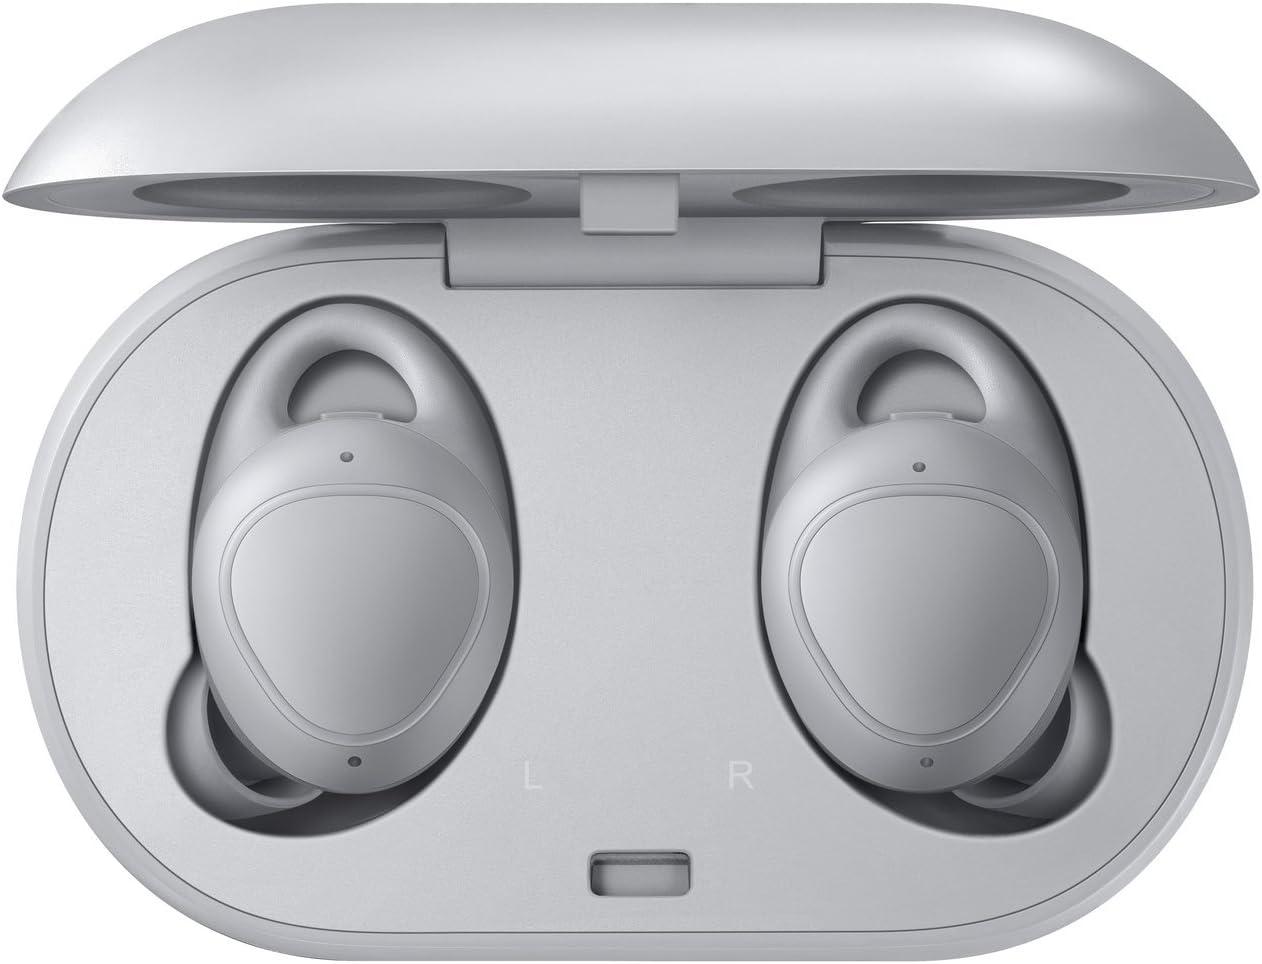 Samsung Icon X 2017 True Wireless Headphones - UK Version - Black Grey